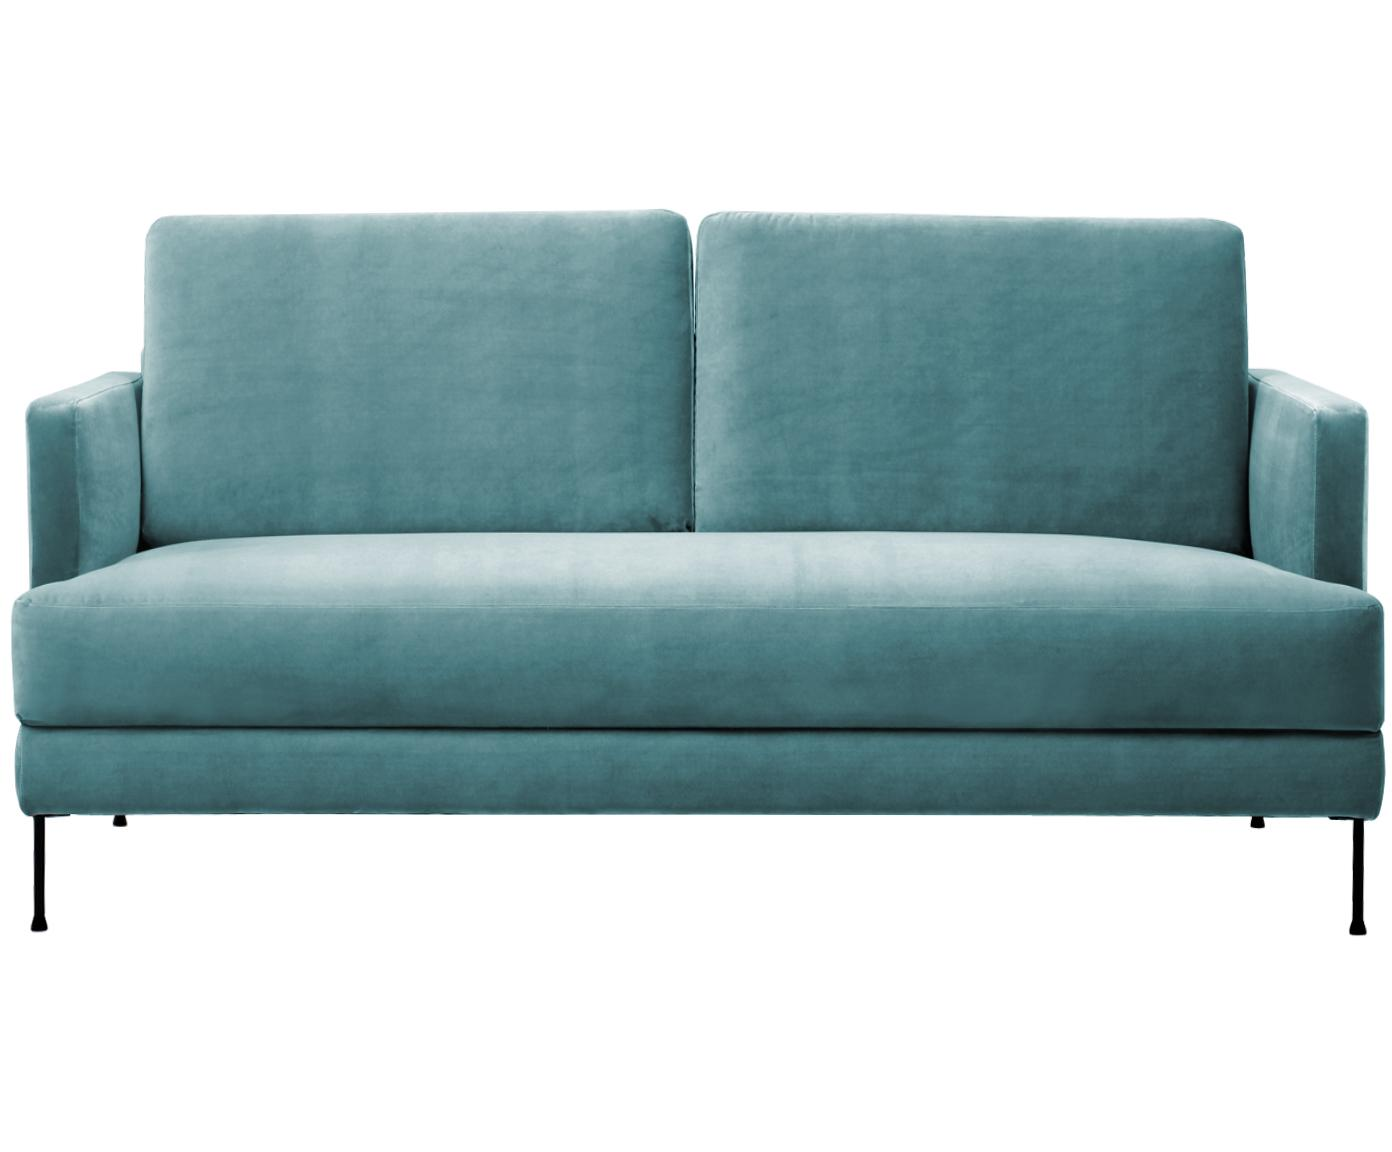 Fluwelen bank Fluente (2-zits), Bekleding: fluweel (hoogwaardig poly, Frame: massief grenenhout, Poten: gelakt metaal, Turquoise, B 168 x D 83 cm